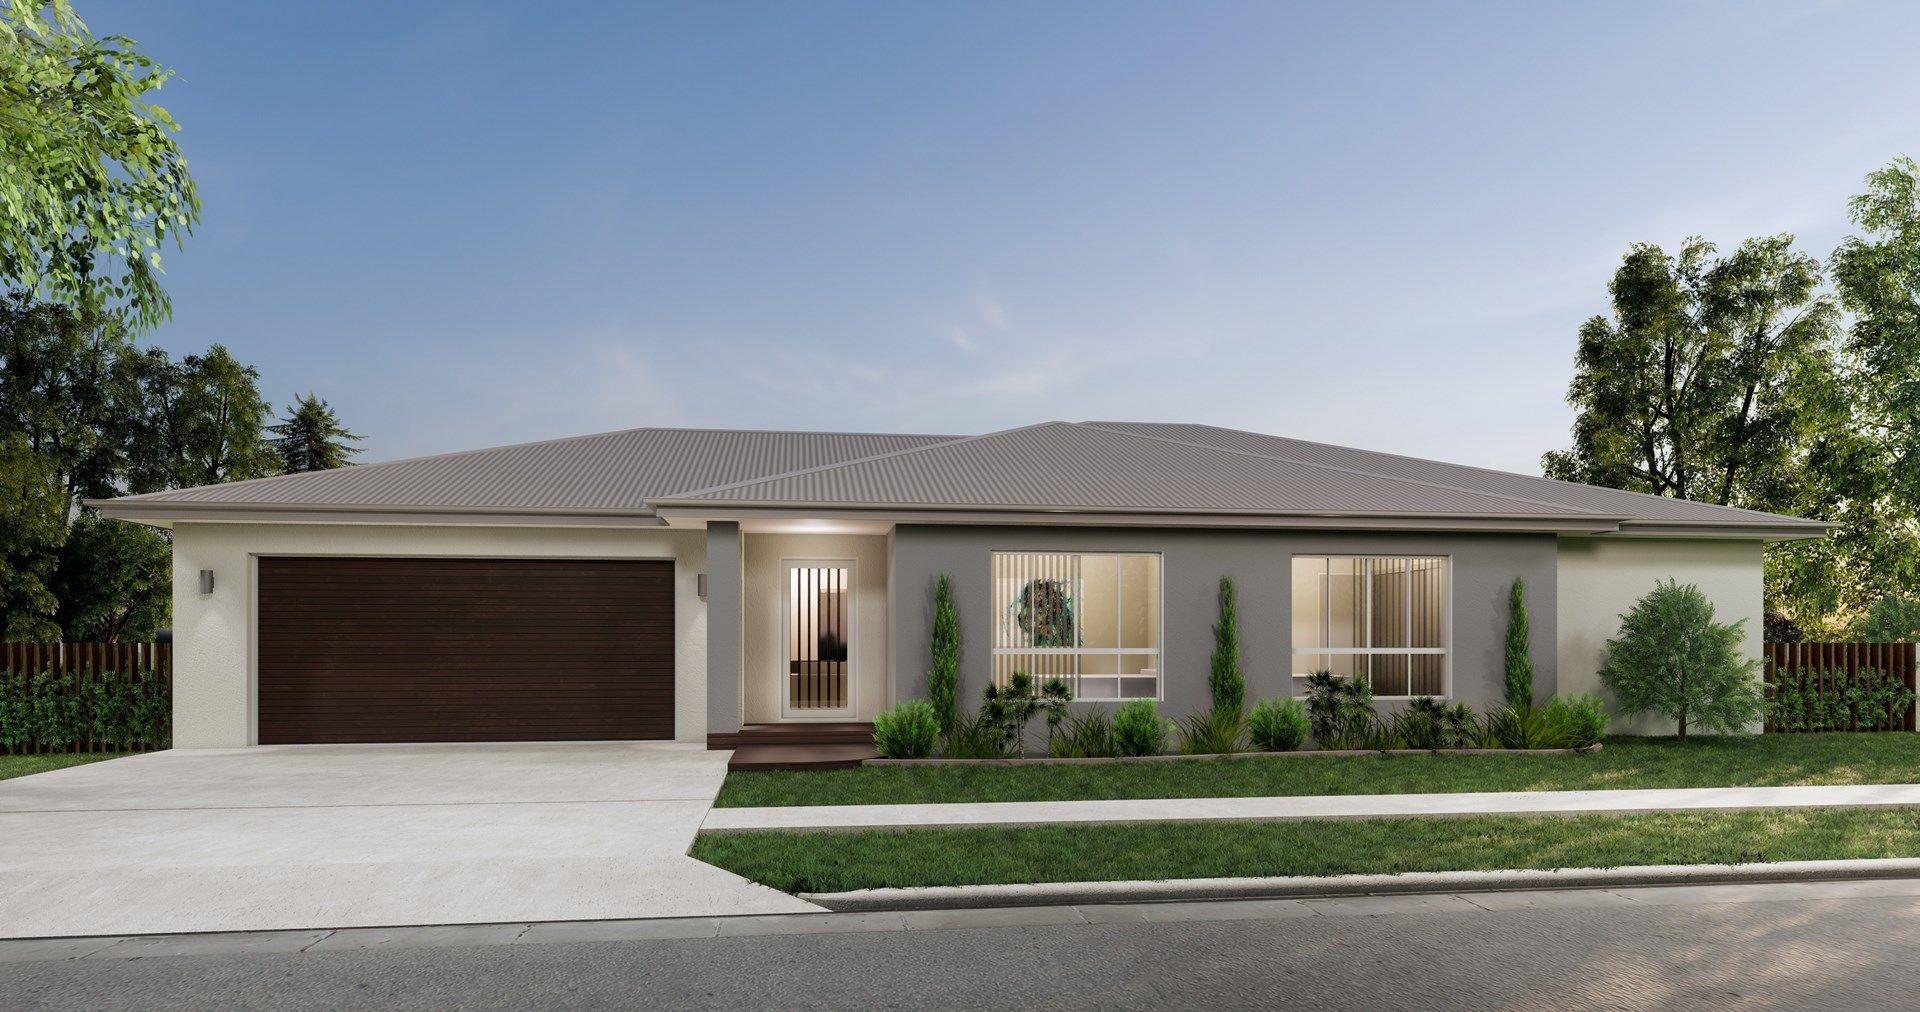 Lot 12 Annie Court, Mareeba QLD 4880, Image 0